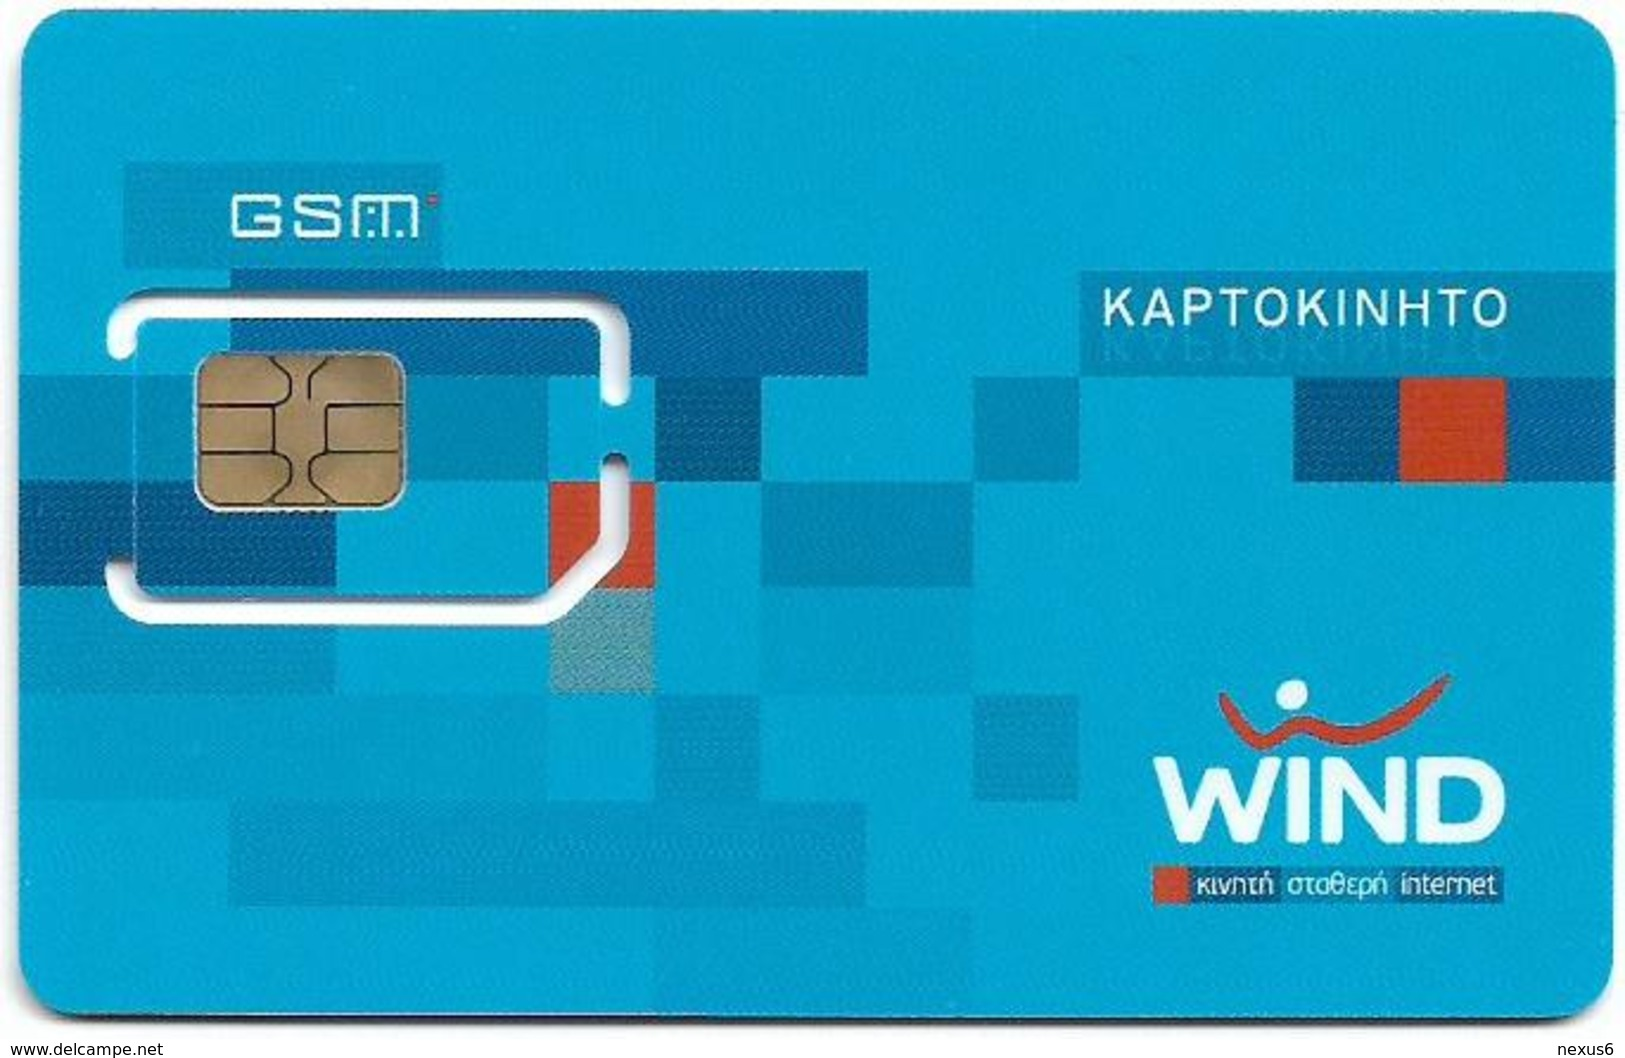 Greece - Wind 64K Mobile GSM Sim Type 2, Mint - Greece